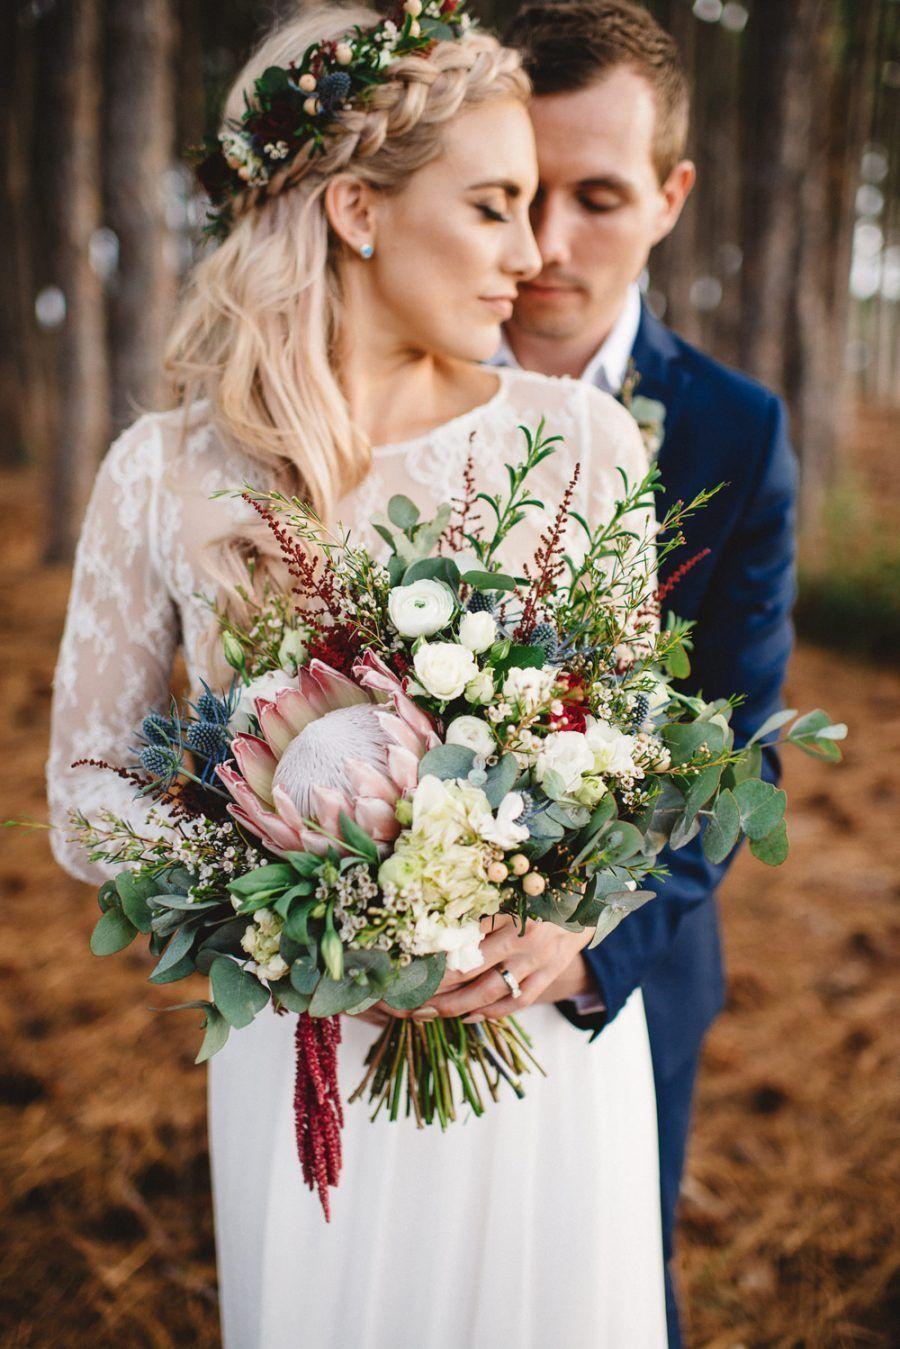 Bohemian boho wedding theme ideas examples inspiration bride